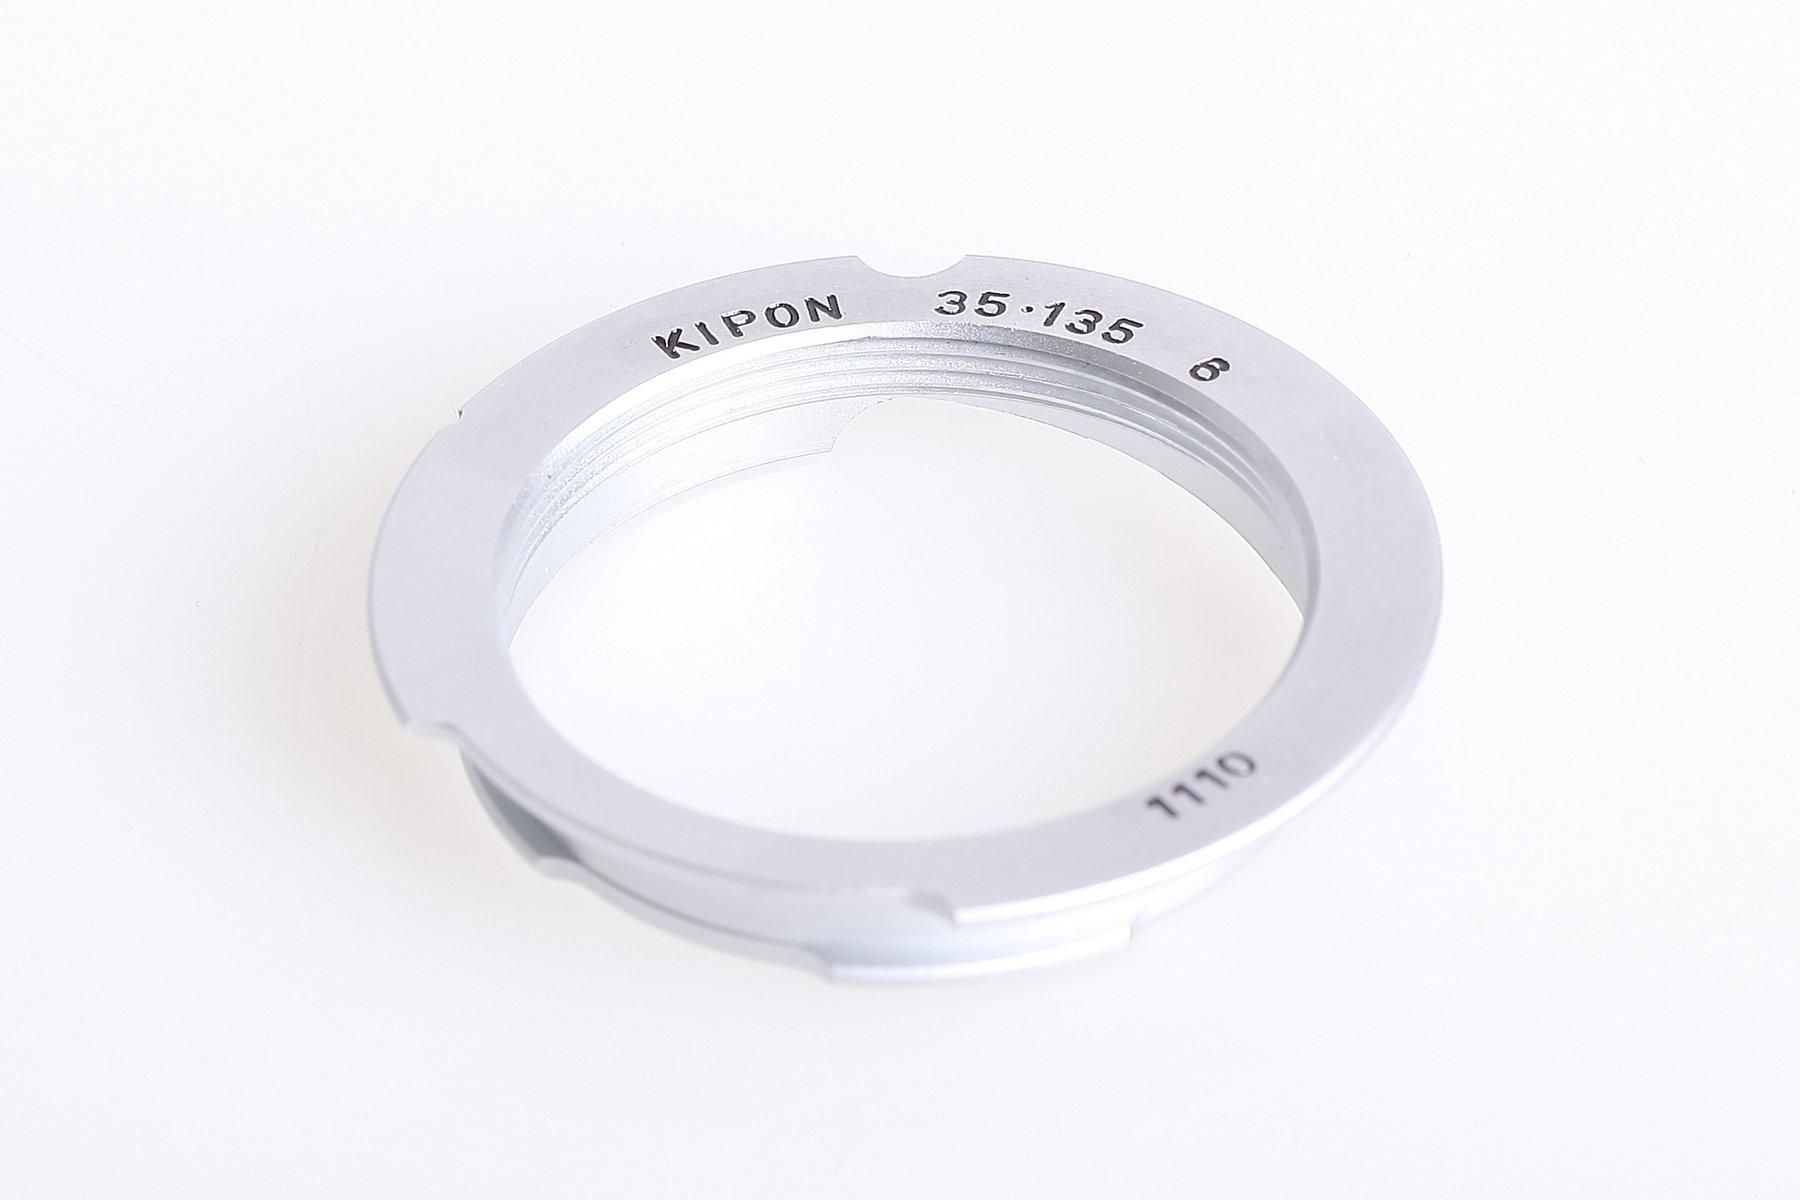 KIPON adaptér objektivu M39 na tělo Leica M pro ohnisko 28/90 mm - 6 bit